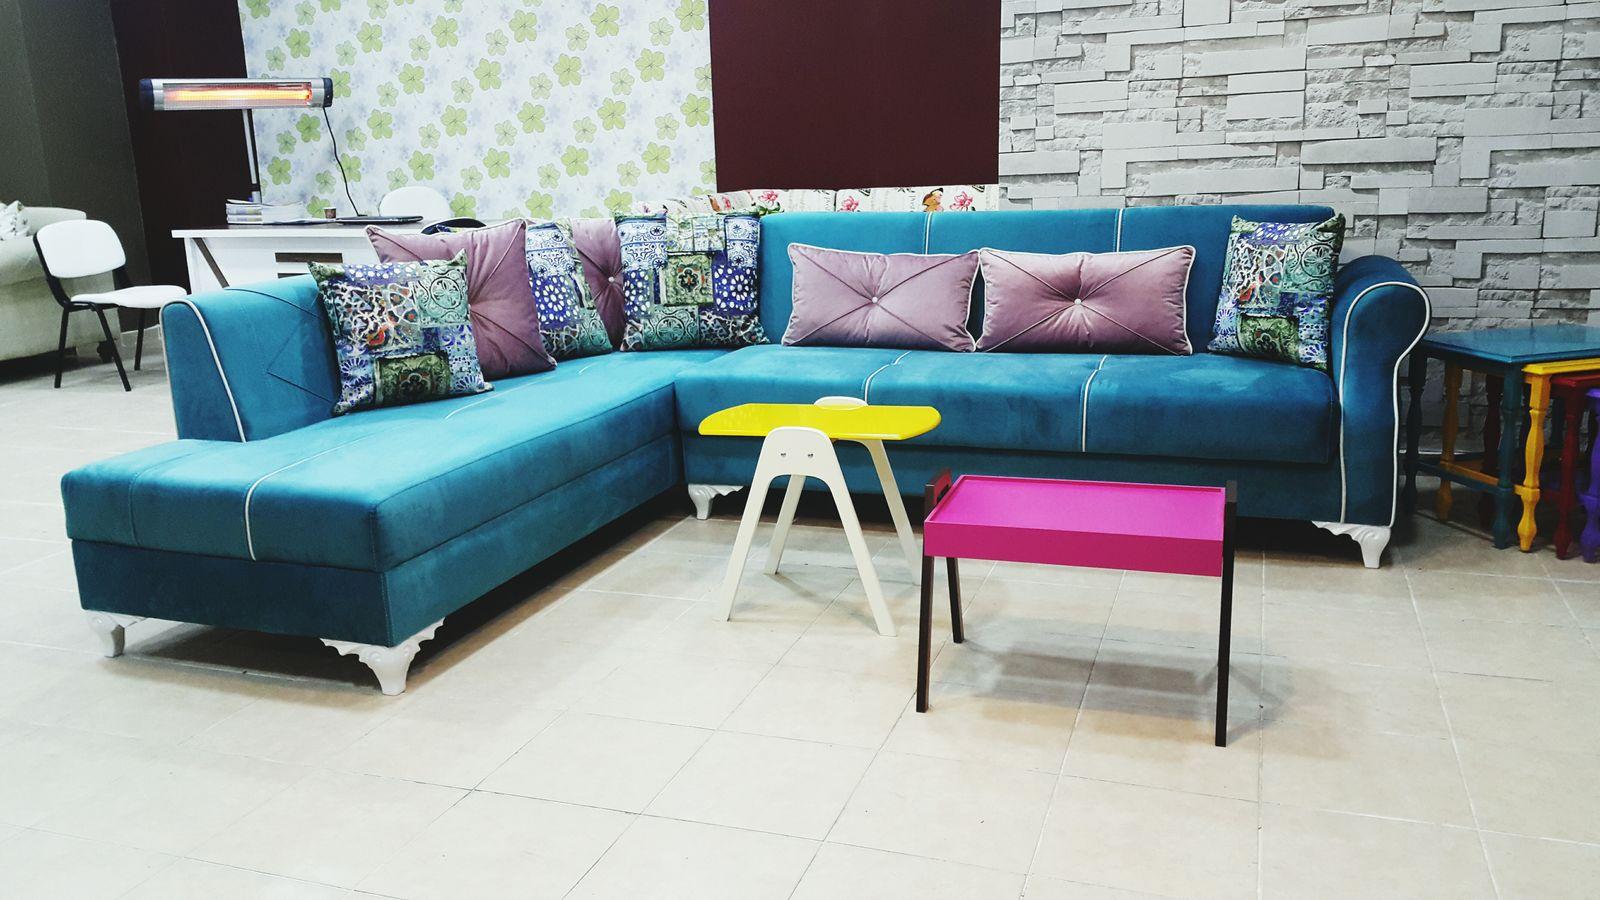 Furniture Shopping Interior Design Designer Goods Handmade Sofa Sofa Tıme Turkish Designer In Adana